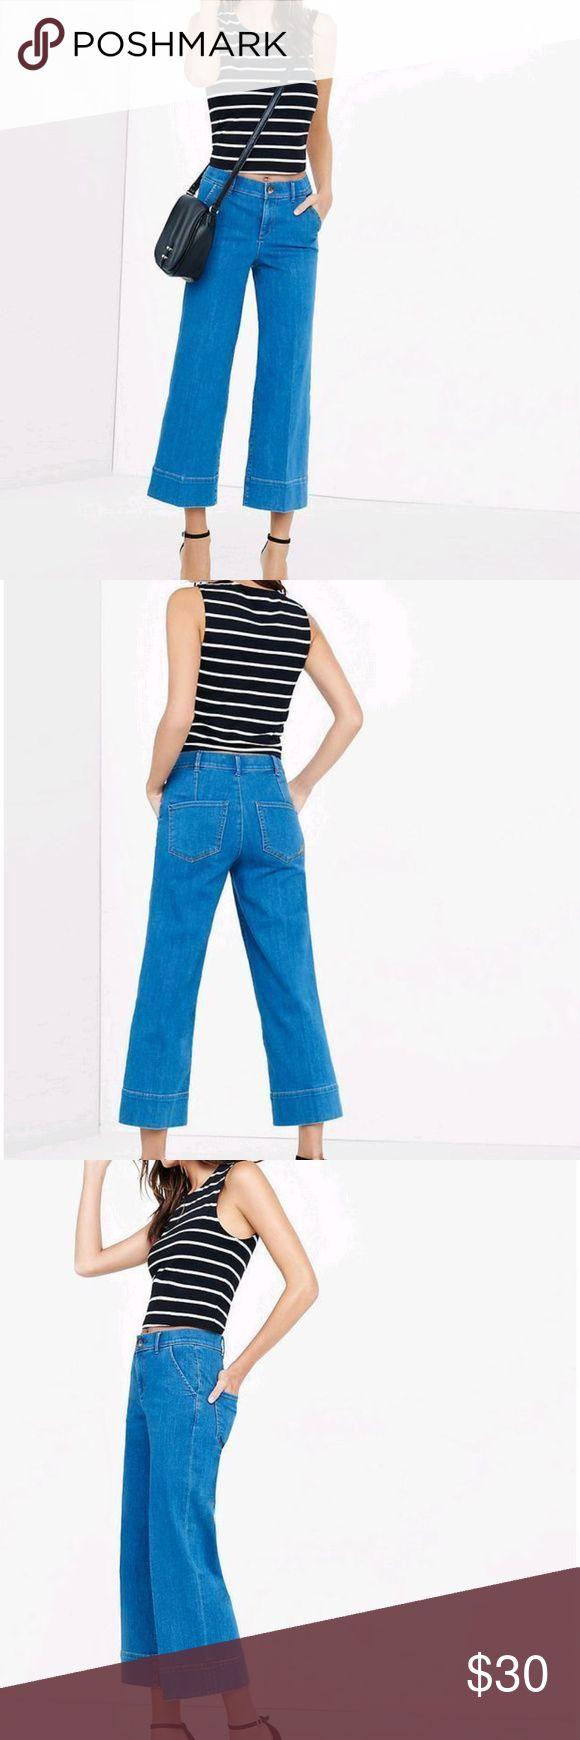 "EXPRESS Women's High Rise Wide Leg Crop Jeans 0R EXPRESS Women's High Rise Wide Leg Crop Blue Jeans Denim Size 0R Inseam: 25.5"" Express Jeans Flare & Wide Leg"